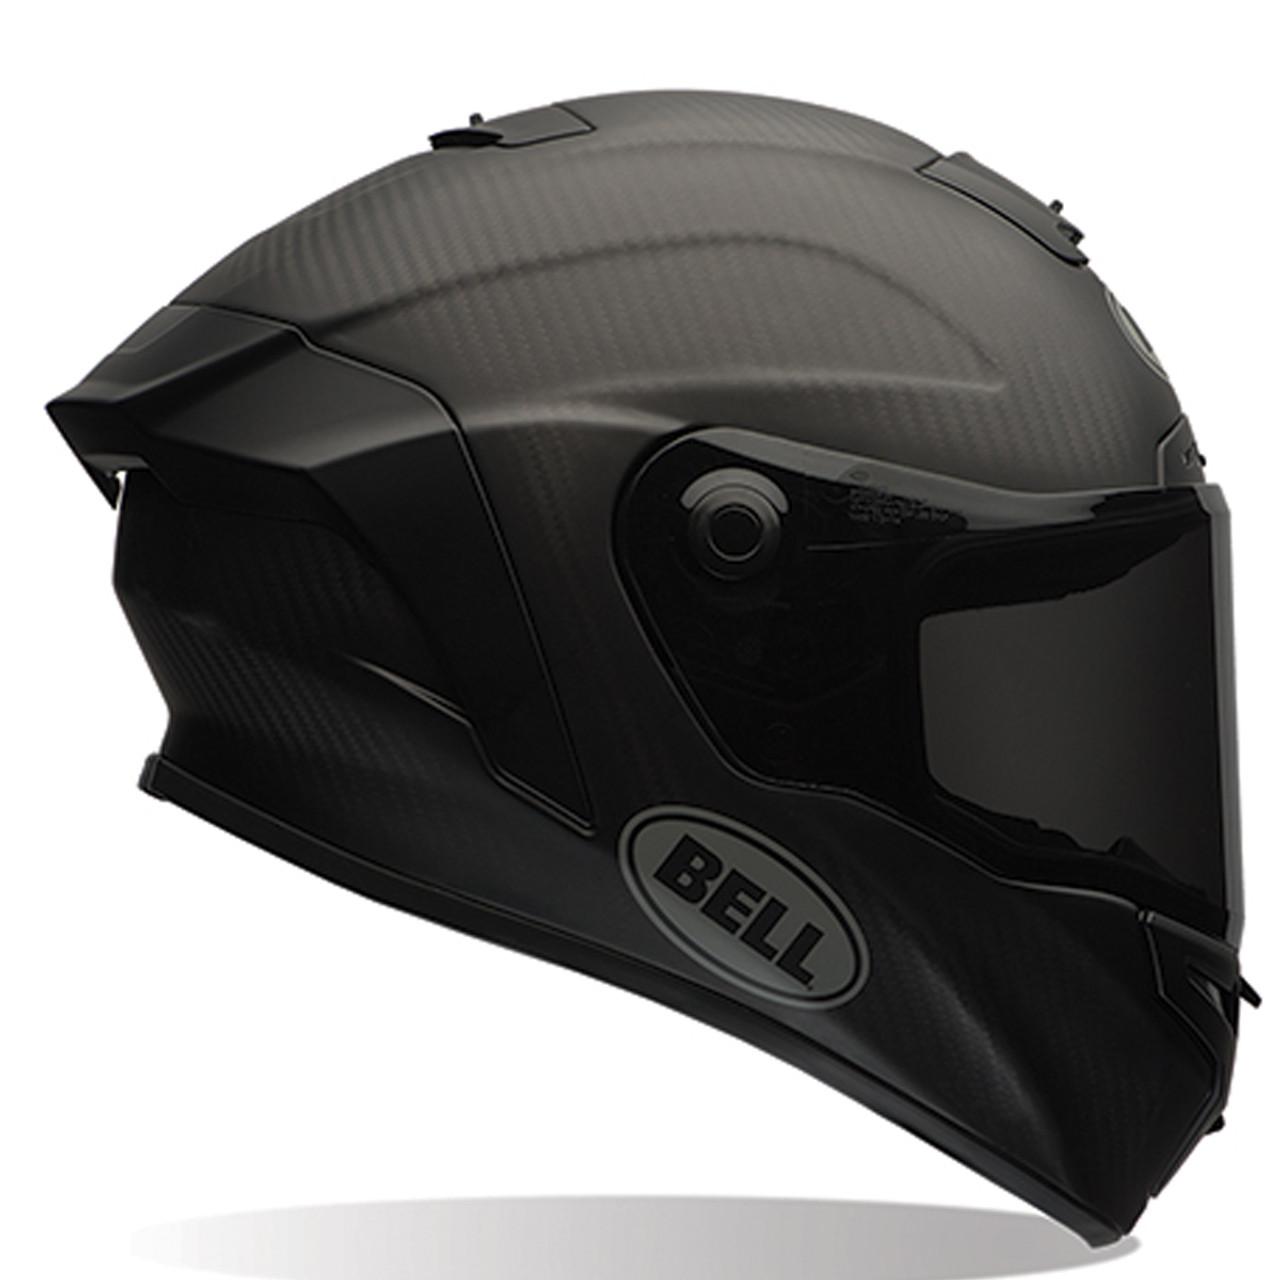 Bell Motorcycle Helmet >> Bell Race Star Dlx Fullface Helmet